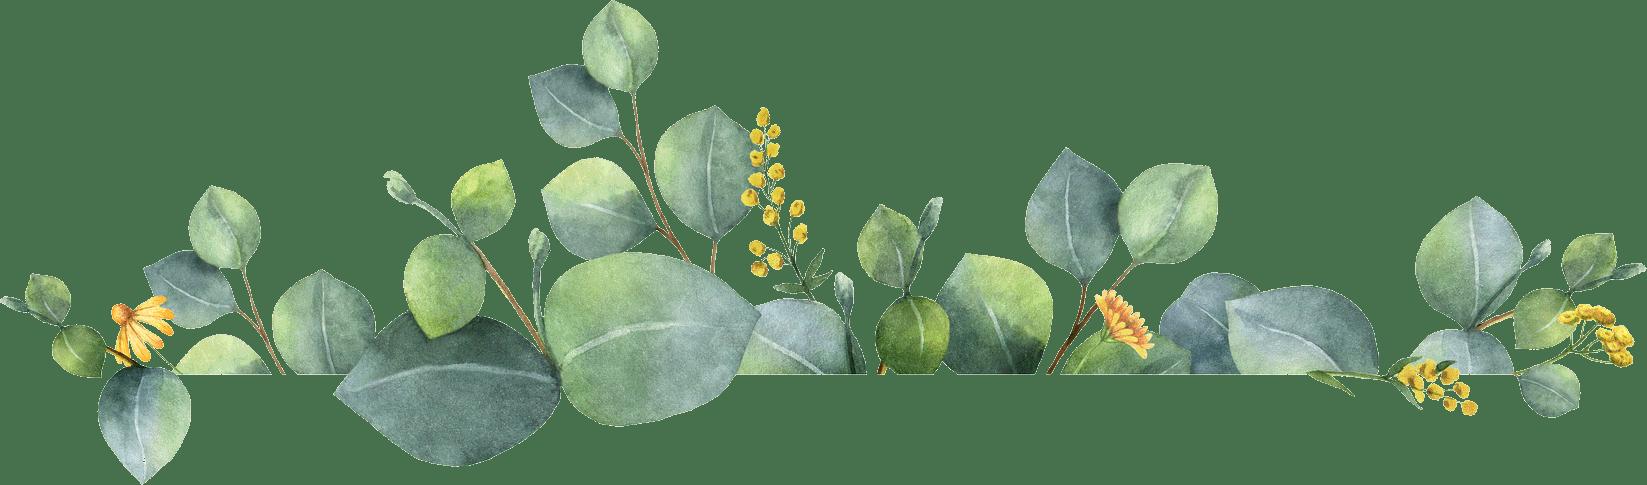 Terrestrial plant, Flower, Botany